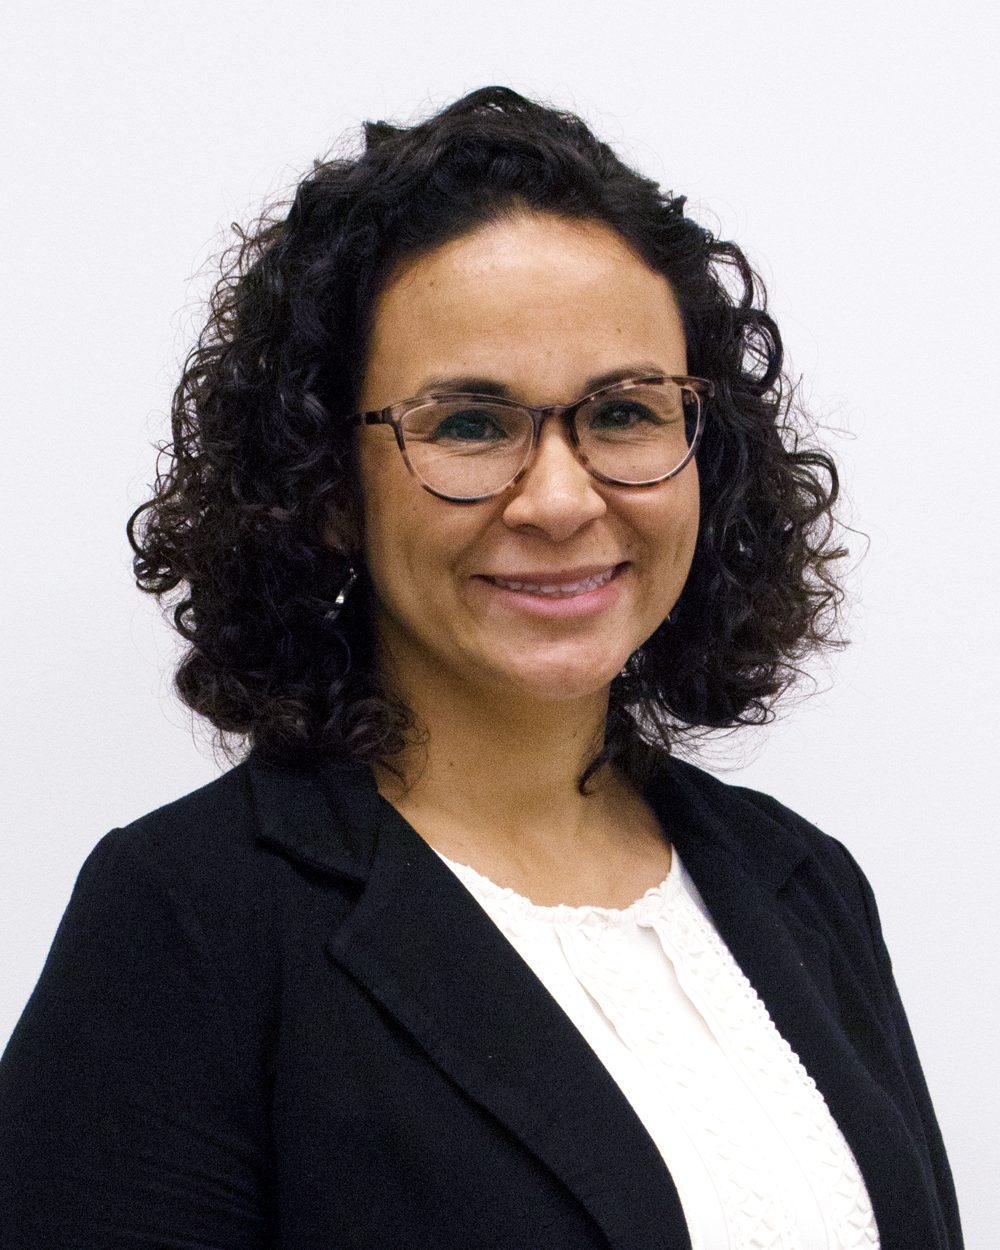 Liliane Ribeiro